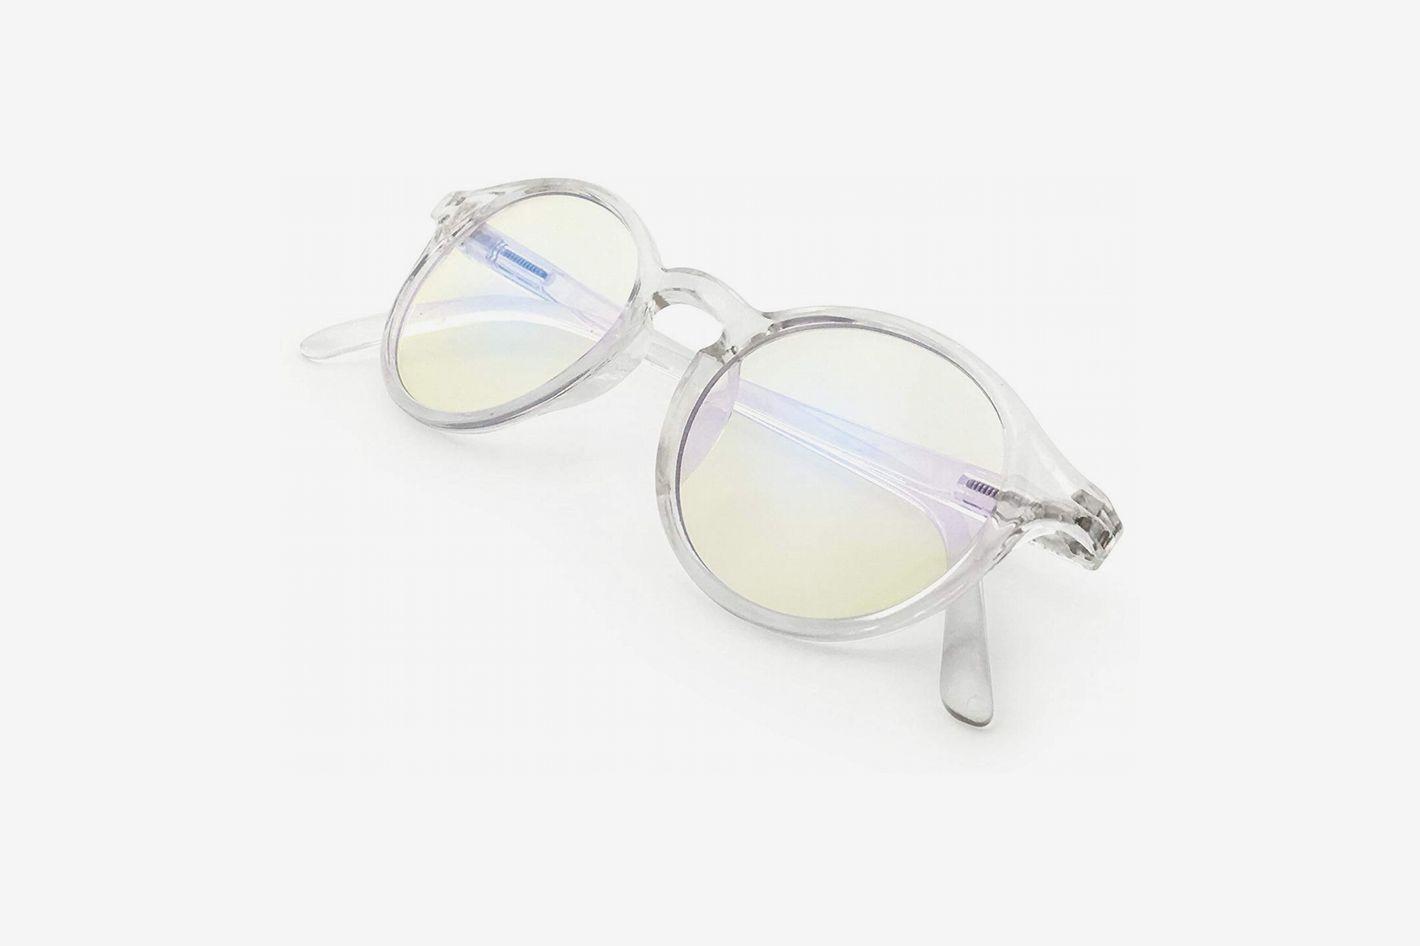 J+S Vision Blue Light Shield Computer Reading Glasses